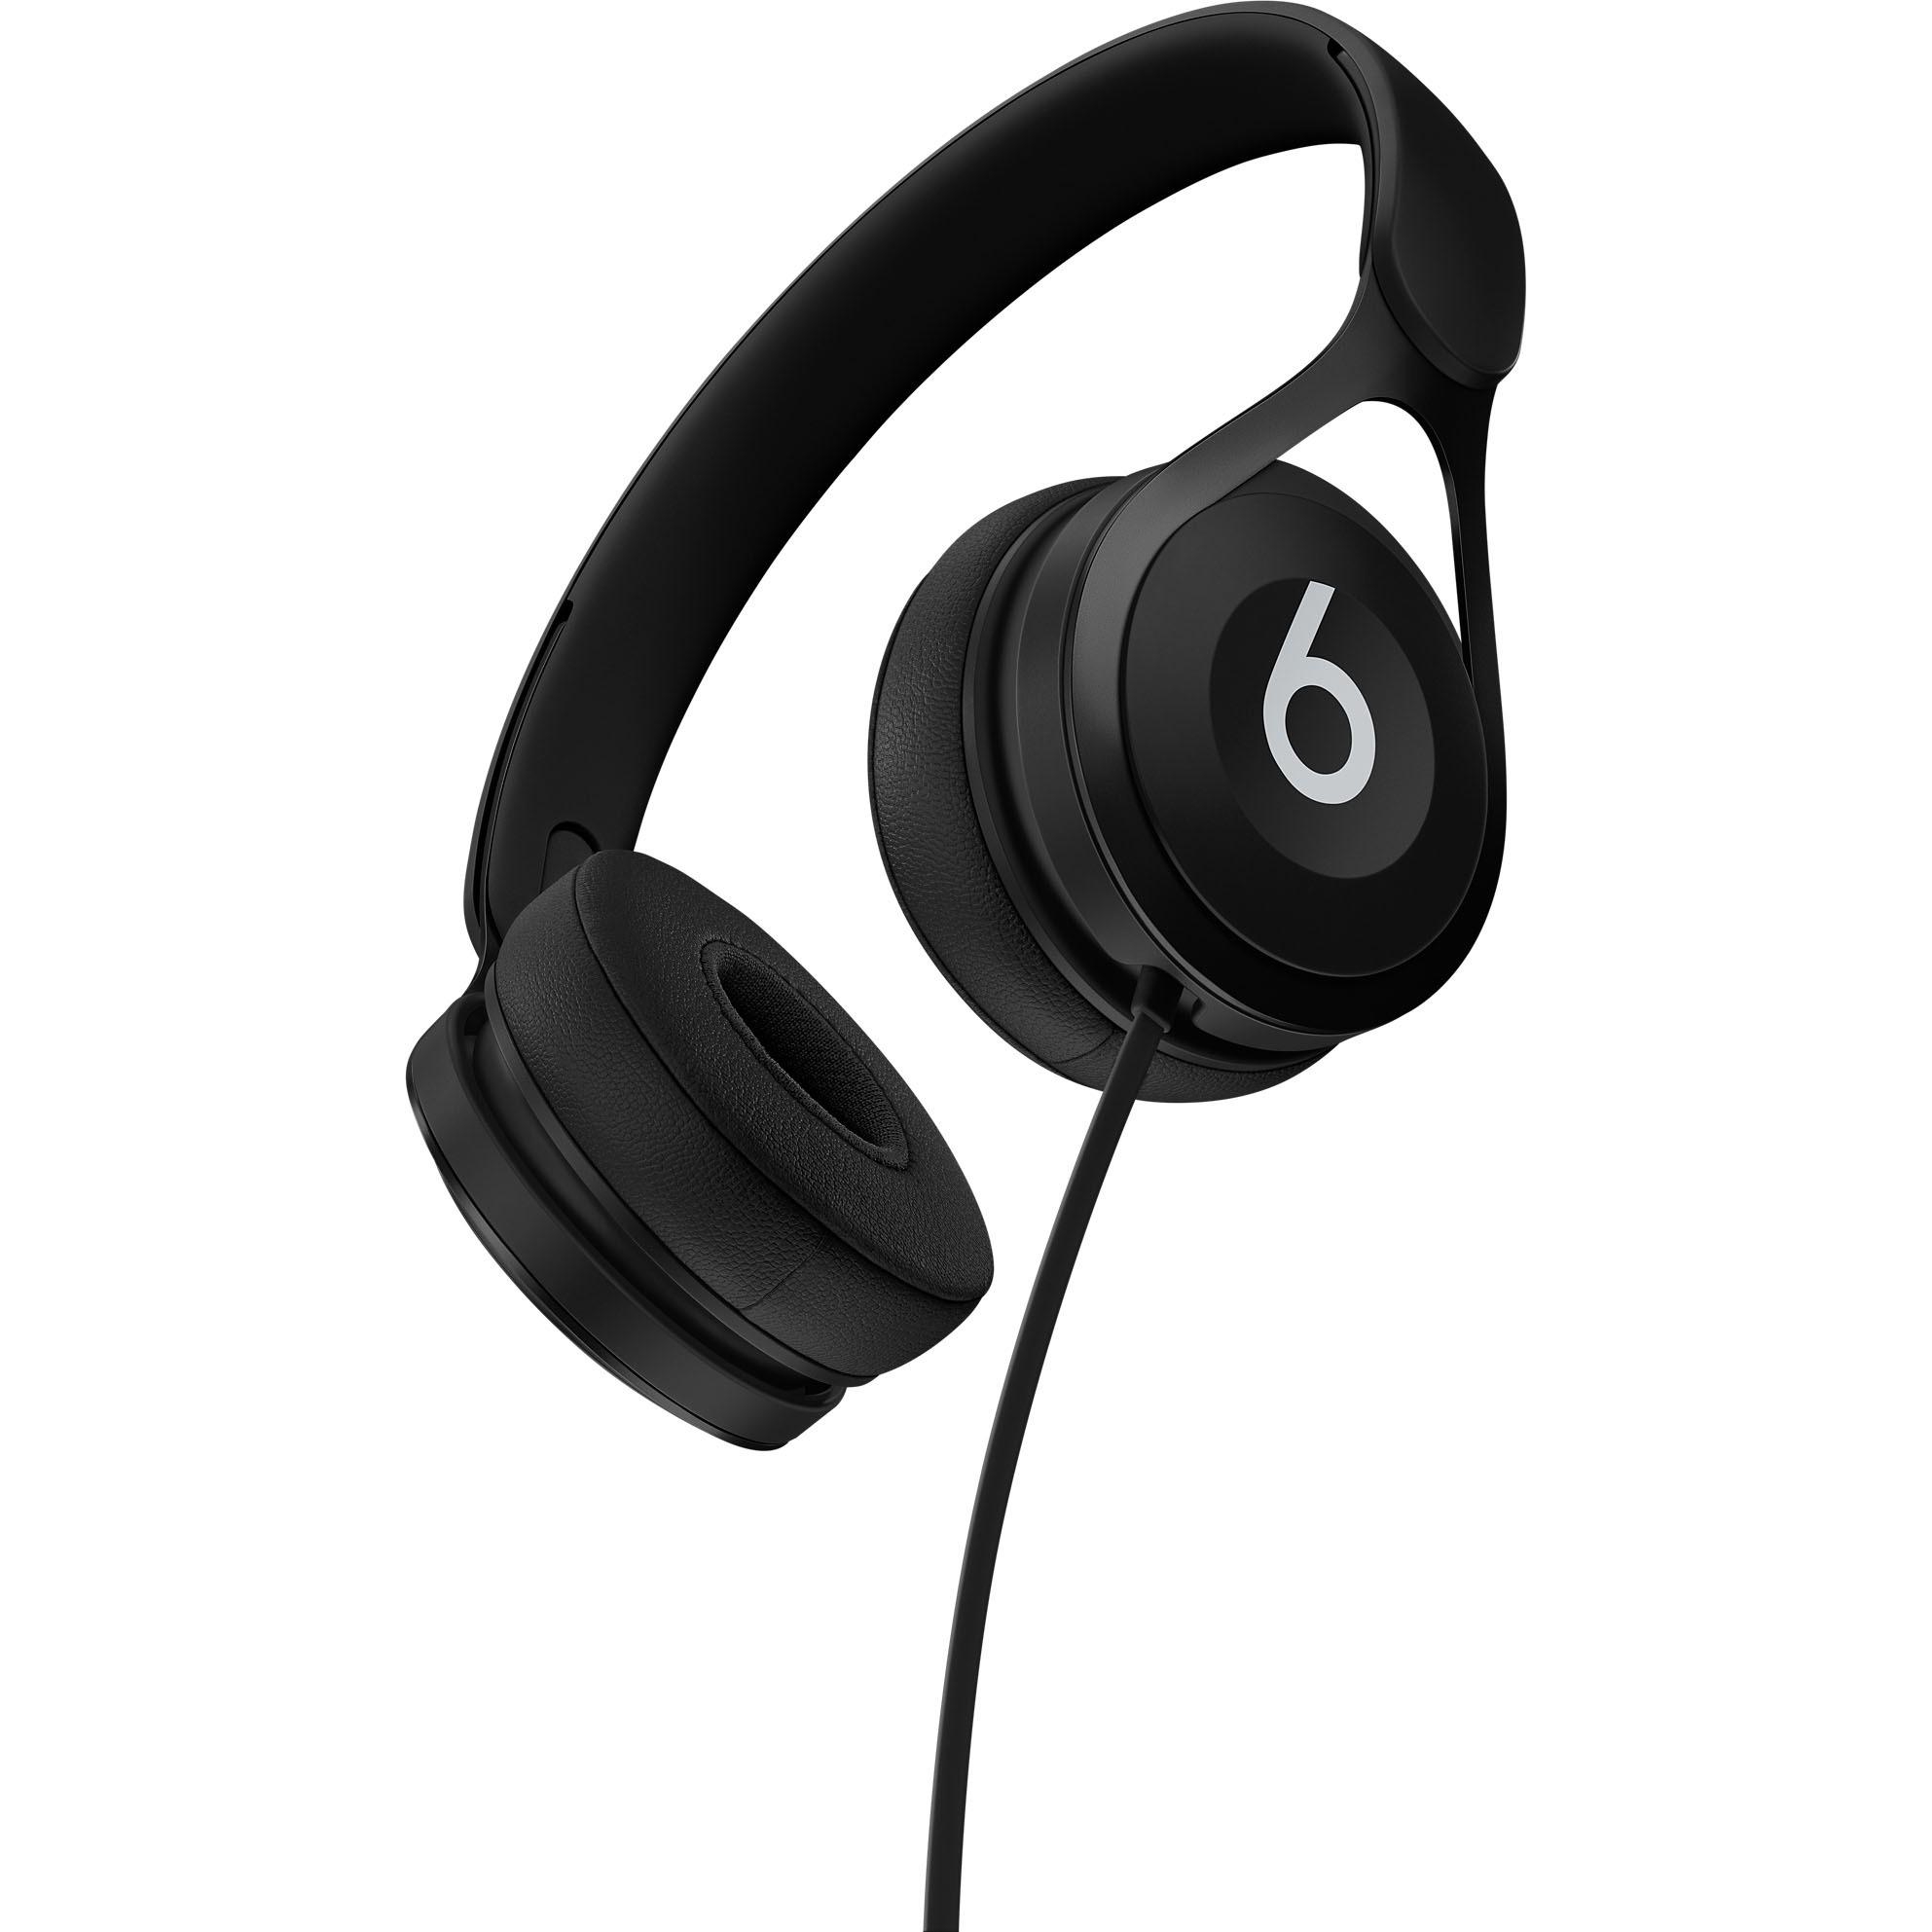 Beats by Dr. Dre EP On-Ear Headphones - Black - Stereo - Black - Mini-phone - Wired - Over-the-head - Binaural - Supra-aural 4